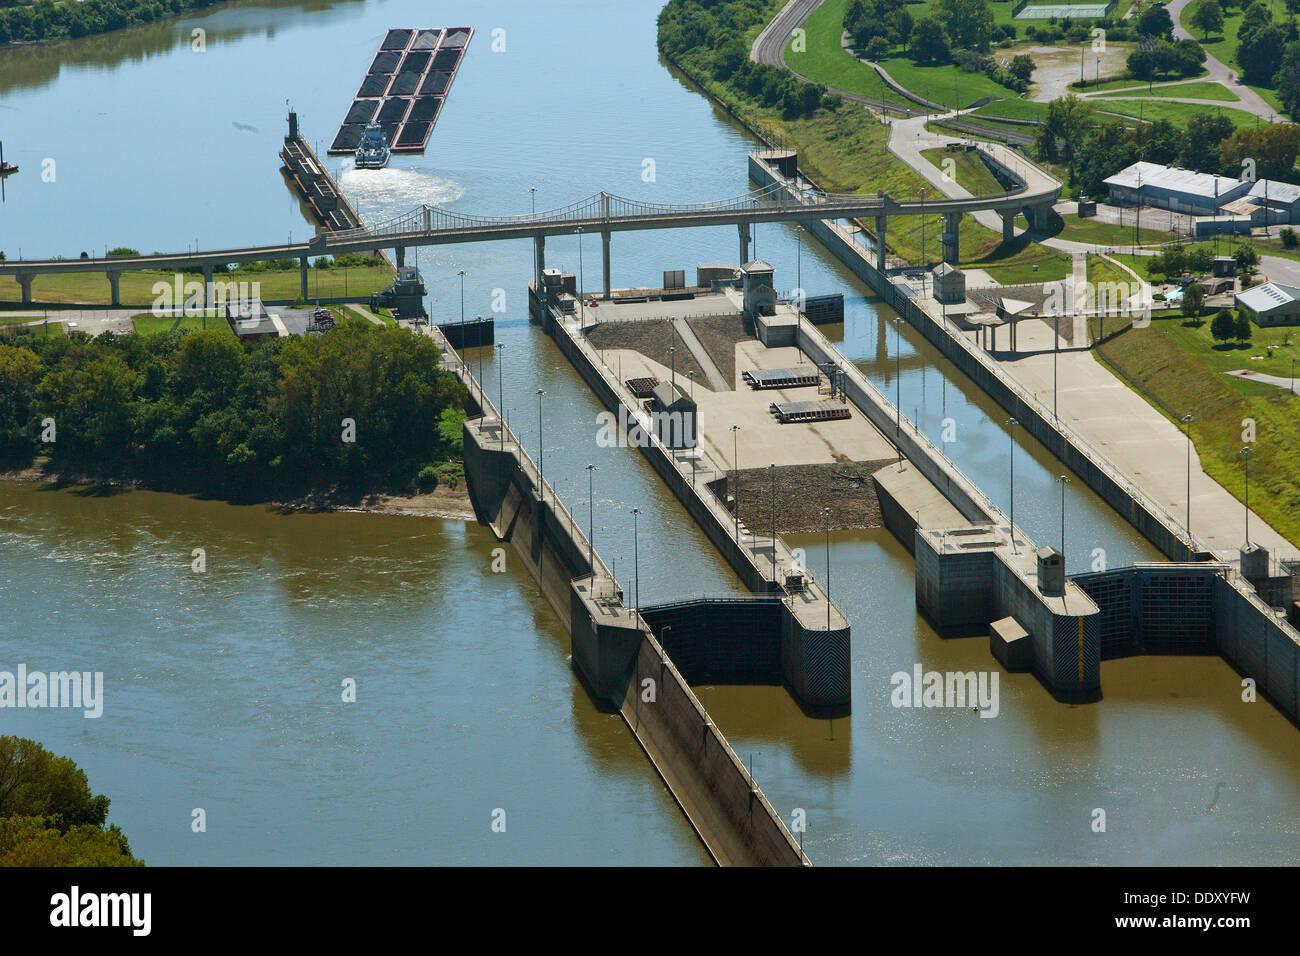 aerial photograph McAlpine Locks and Dam, Ohio River at Louisville, Kentucky - Stock Image